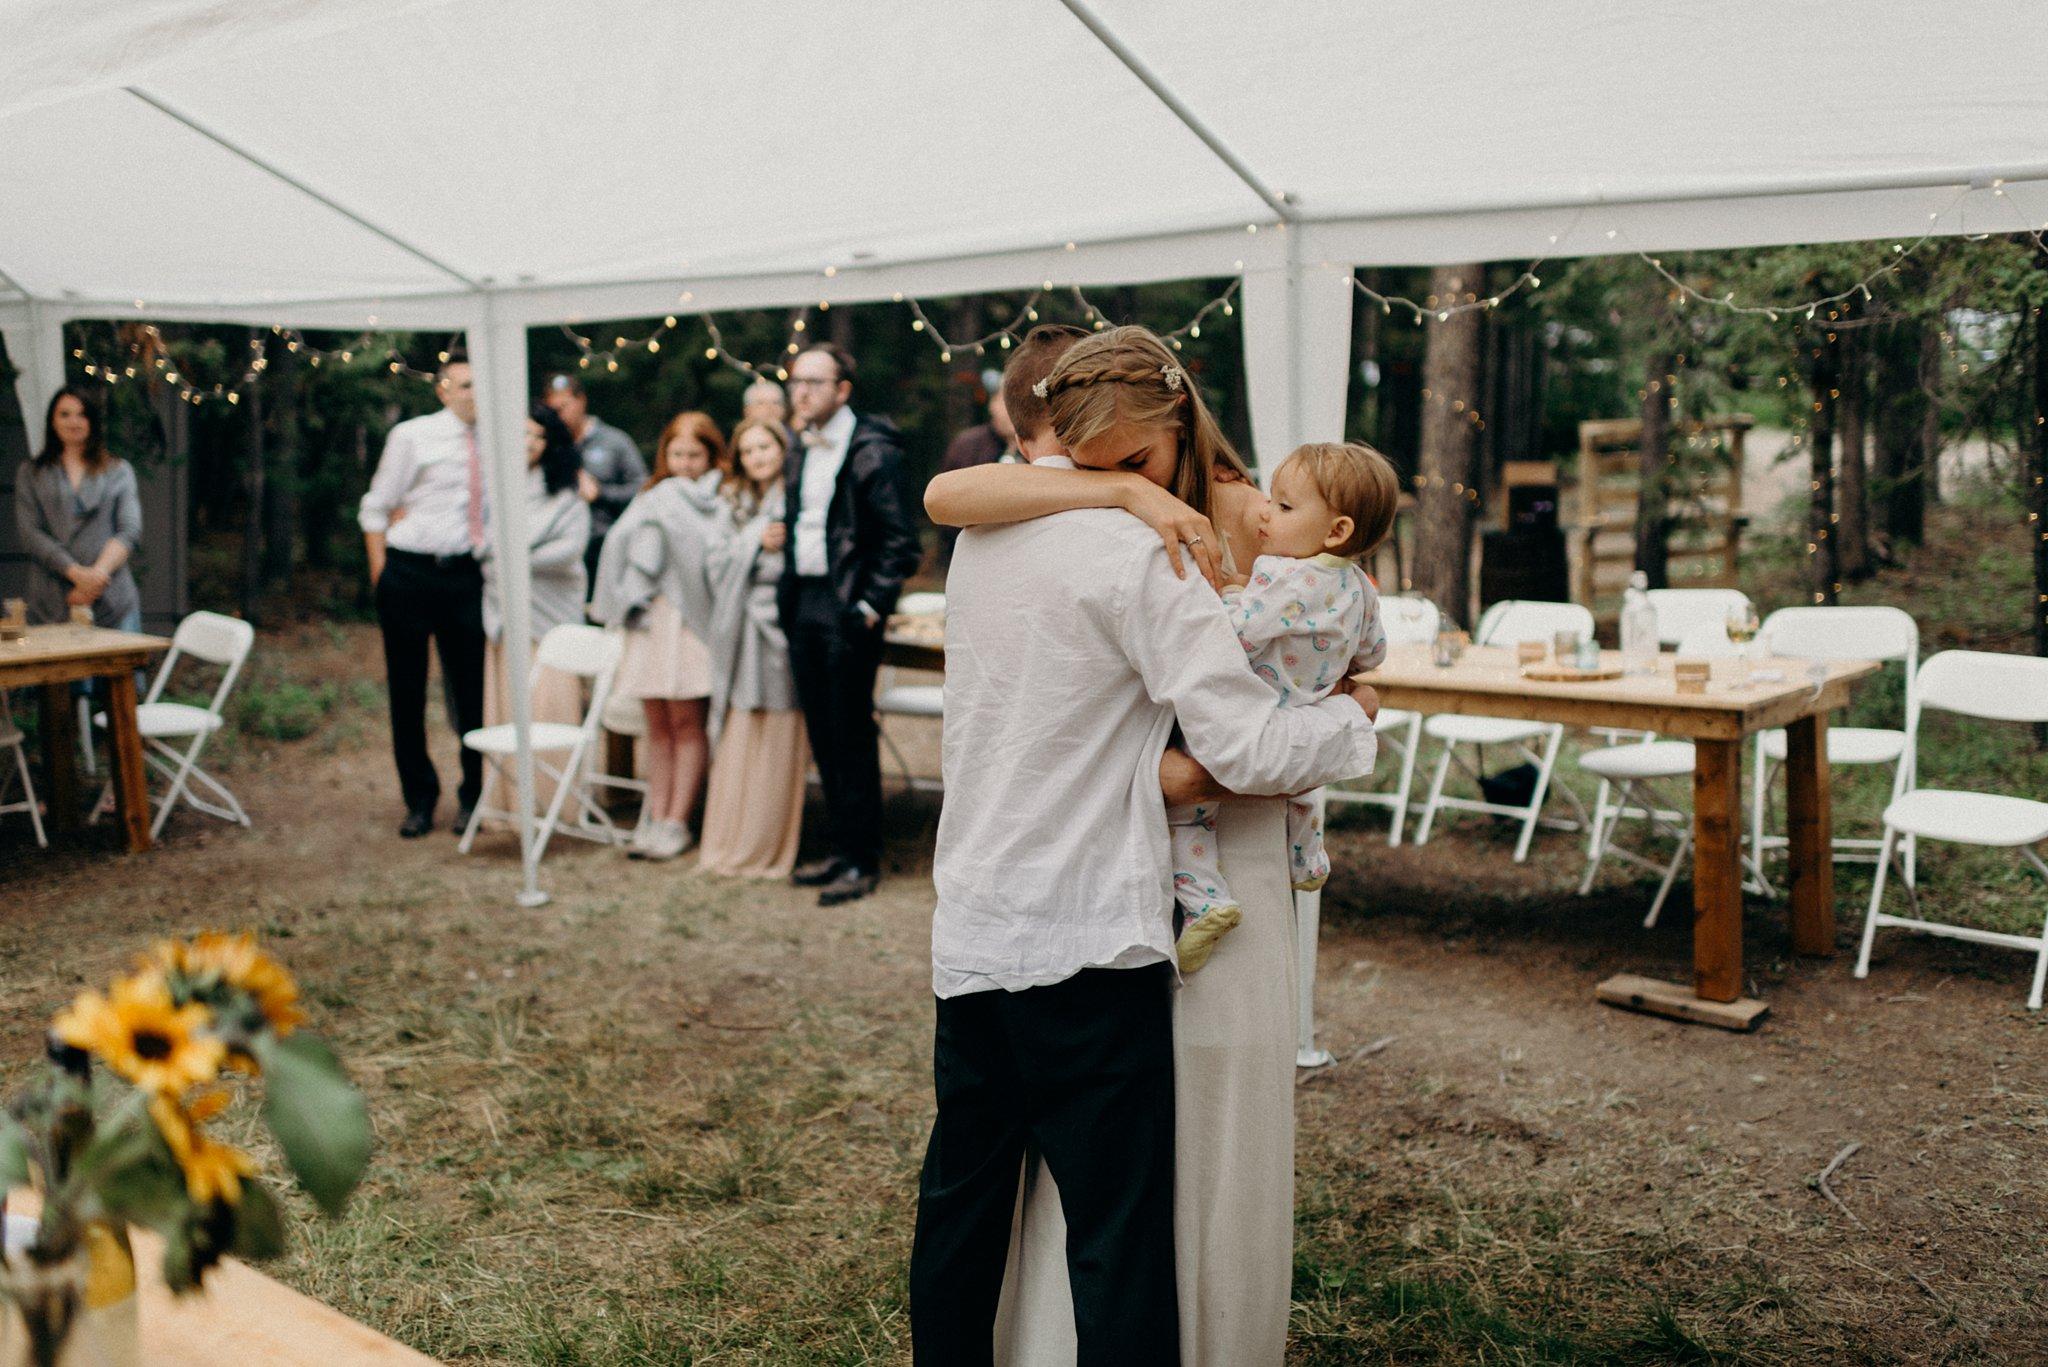 kaihla_tonai_intimate_wedding_elopement_photographer_6434.jpg